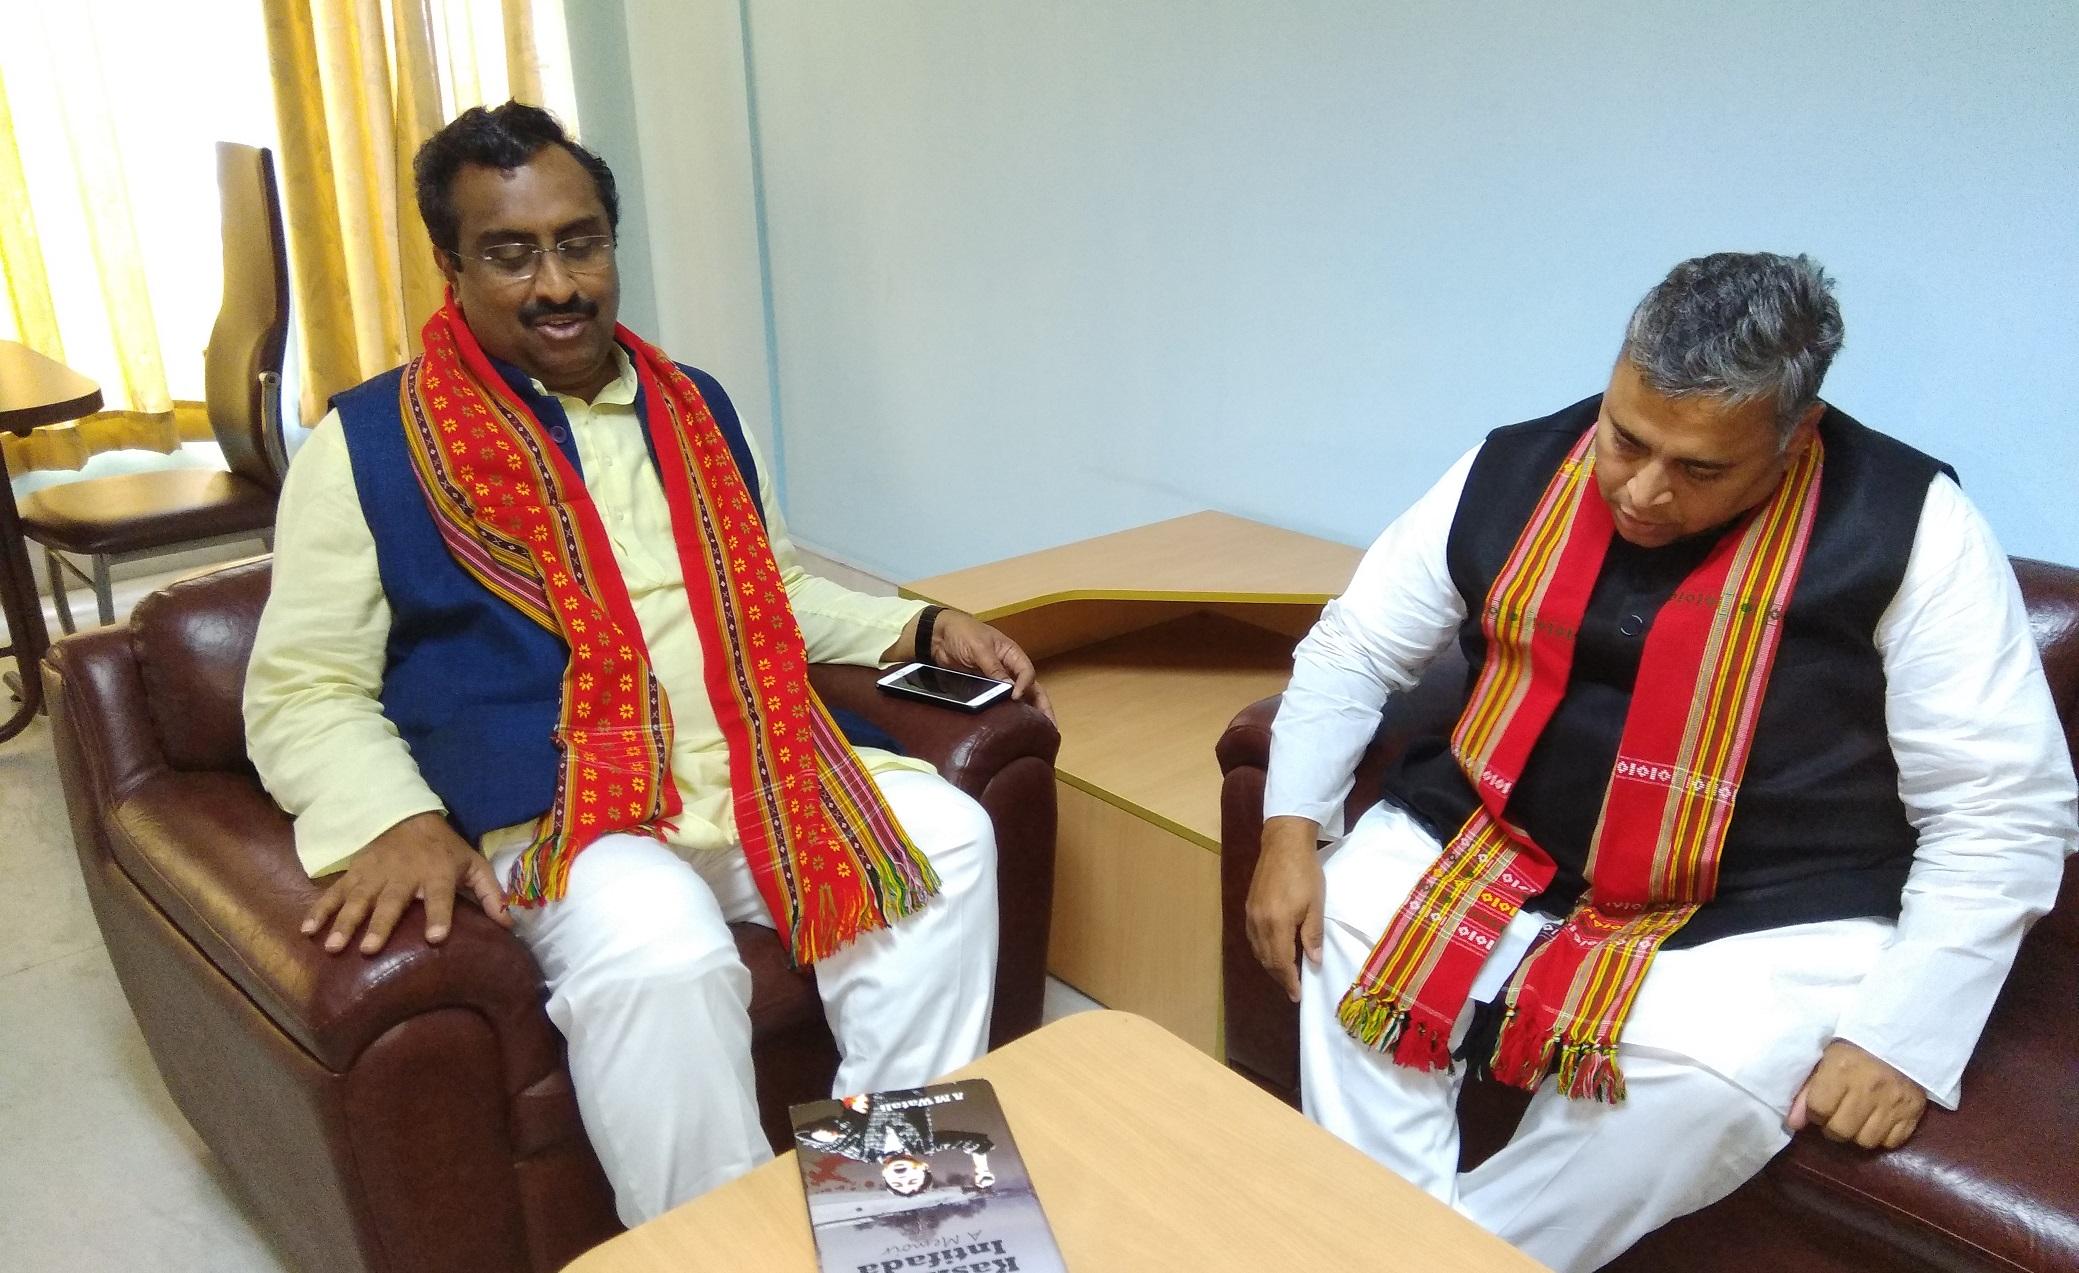 BJP national general secretary Ram Madhav in Agartala. (File image)